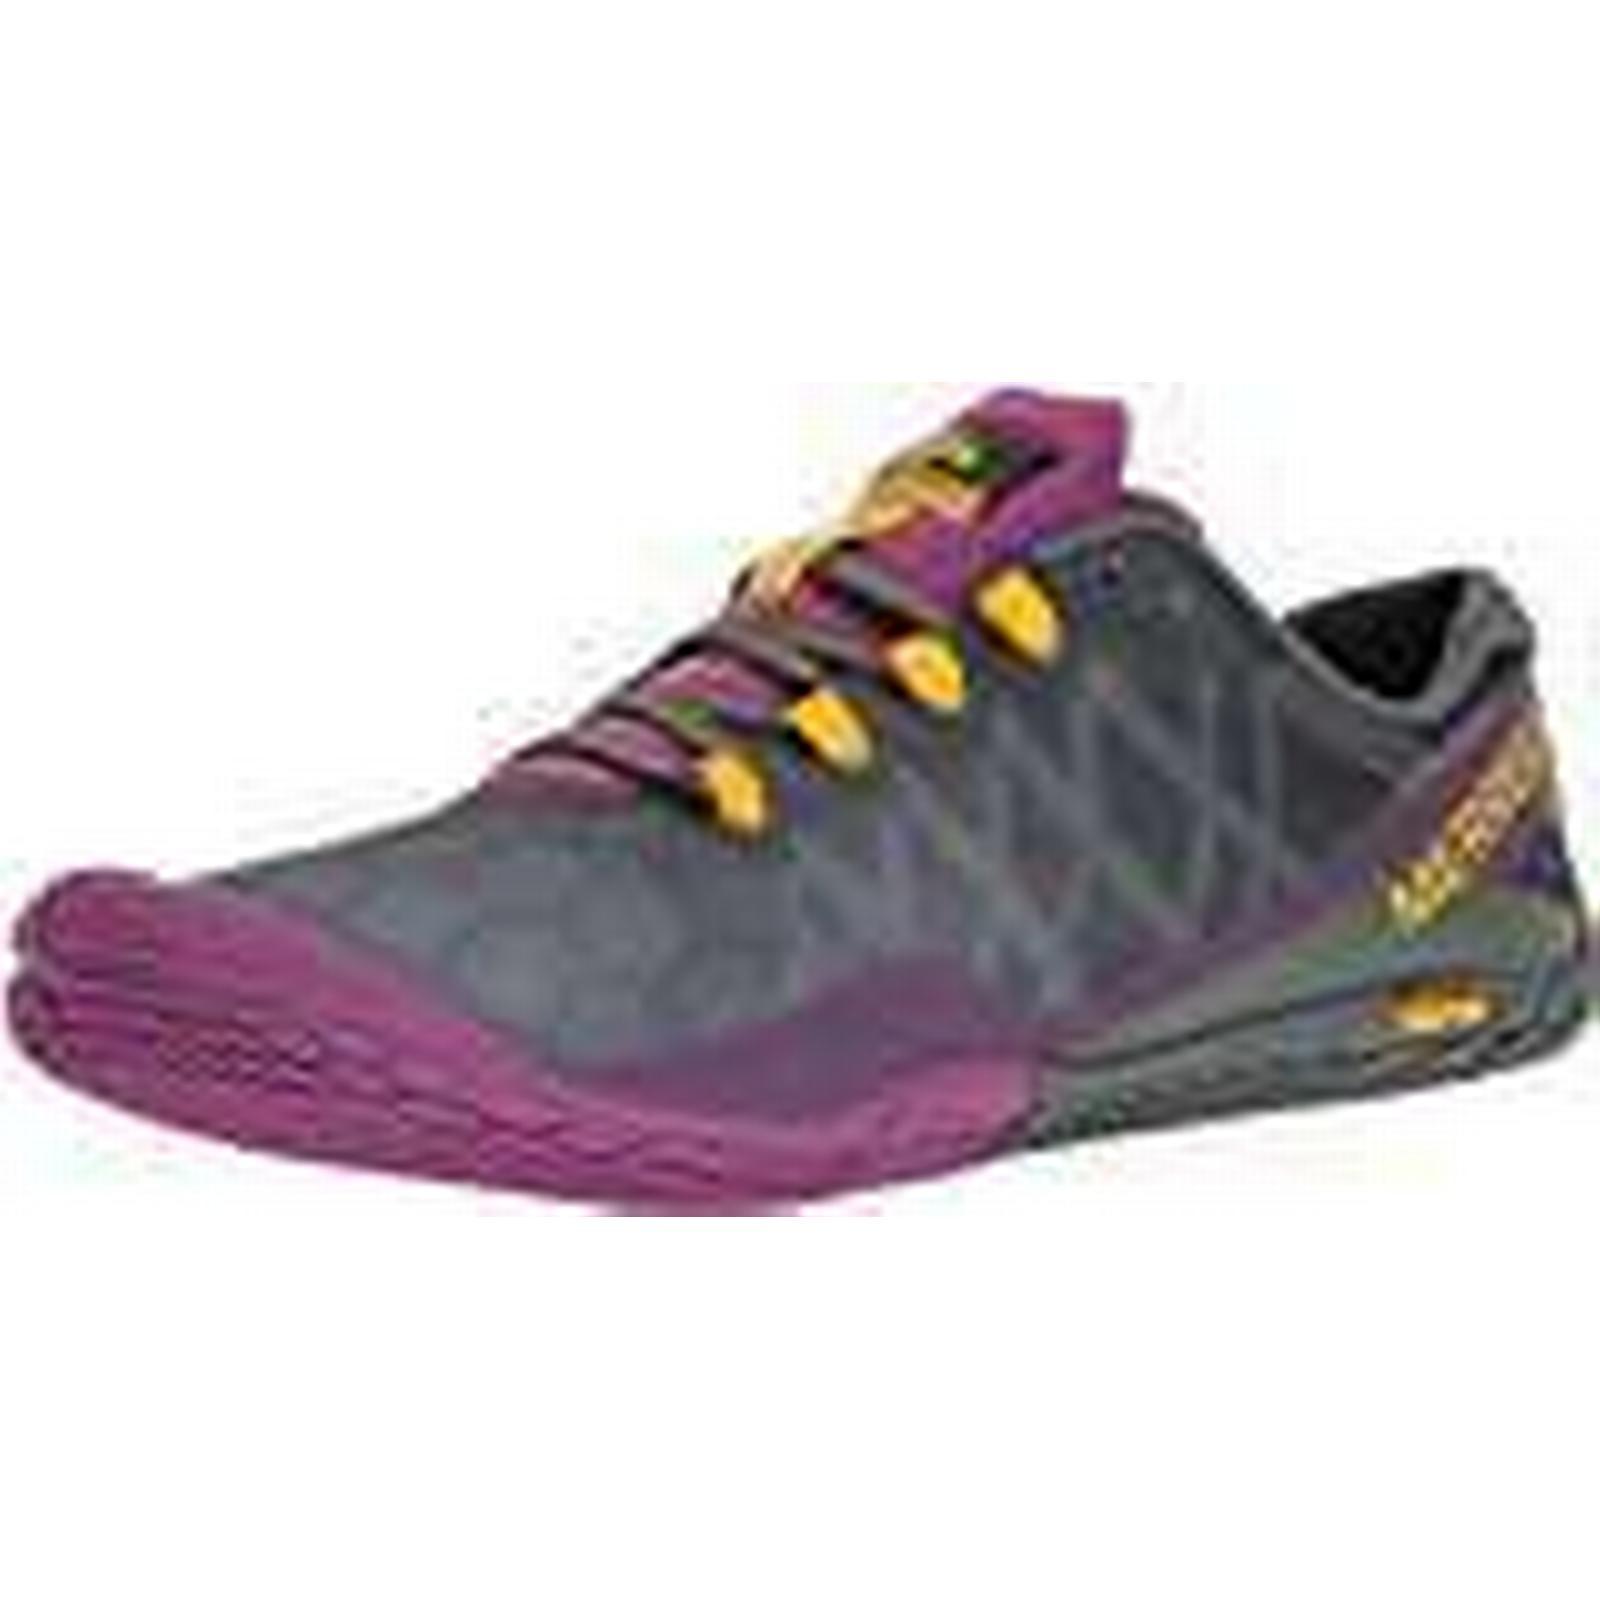 Merrell Women's Vapor Glove 3 Trail 5.5 Running Shoes, Grey (Turbulence), 5.5 Trail UK b32c04